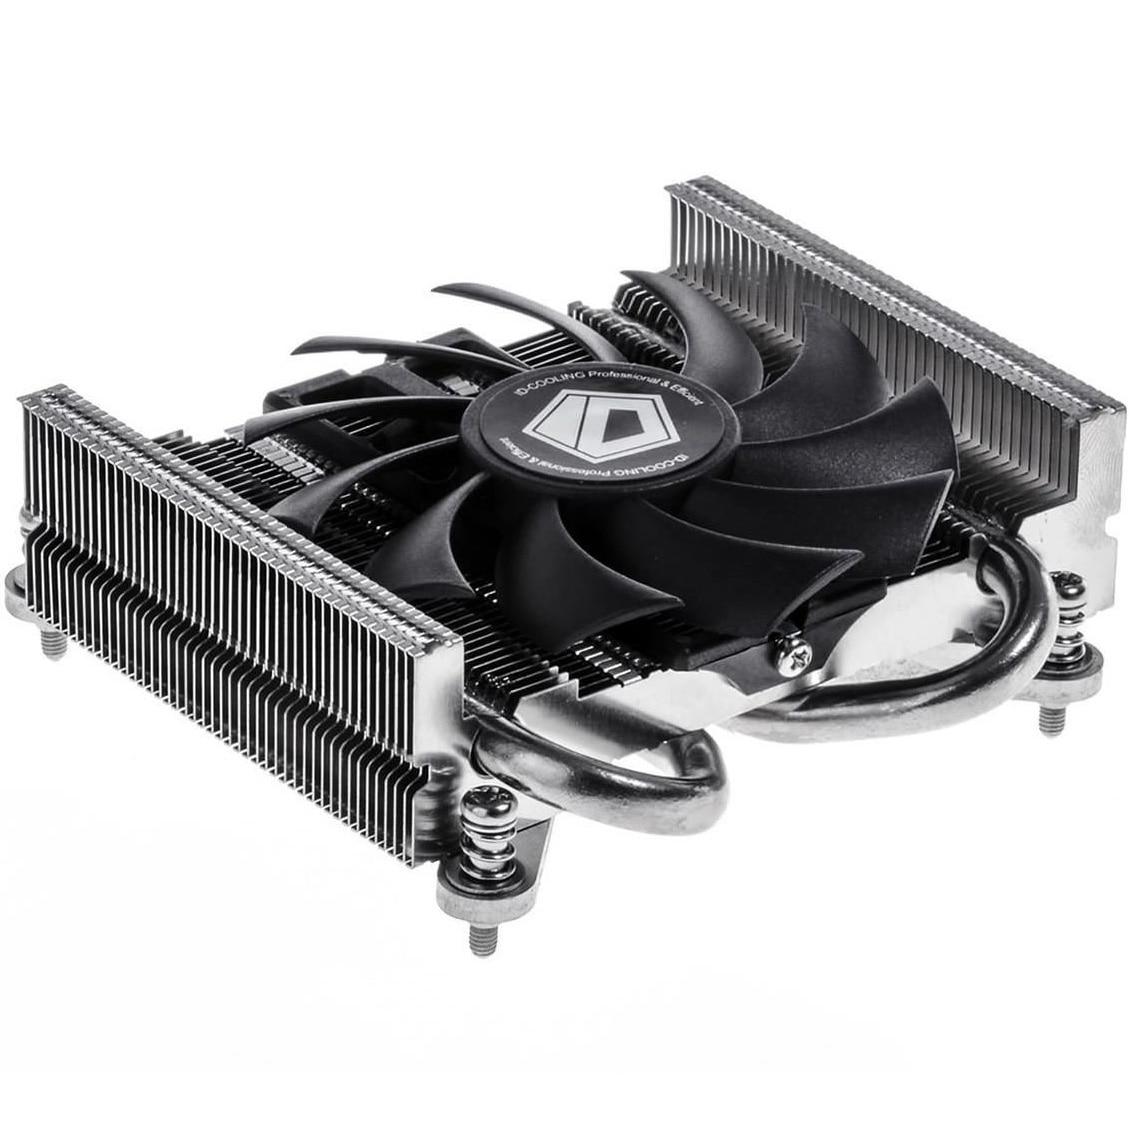 Fotografie Cooler procesor ID-Cooling IS-25i, compatibil Intel